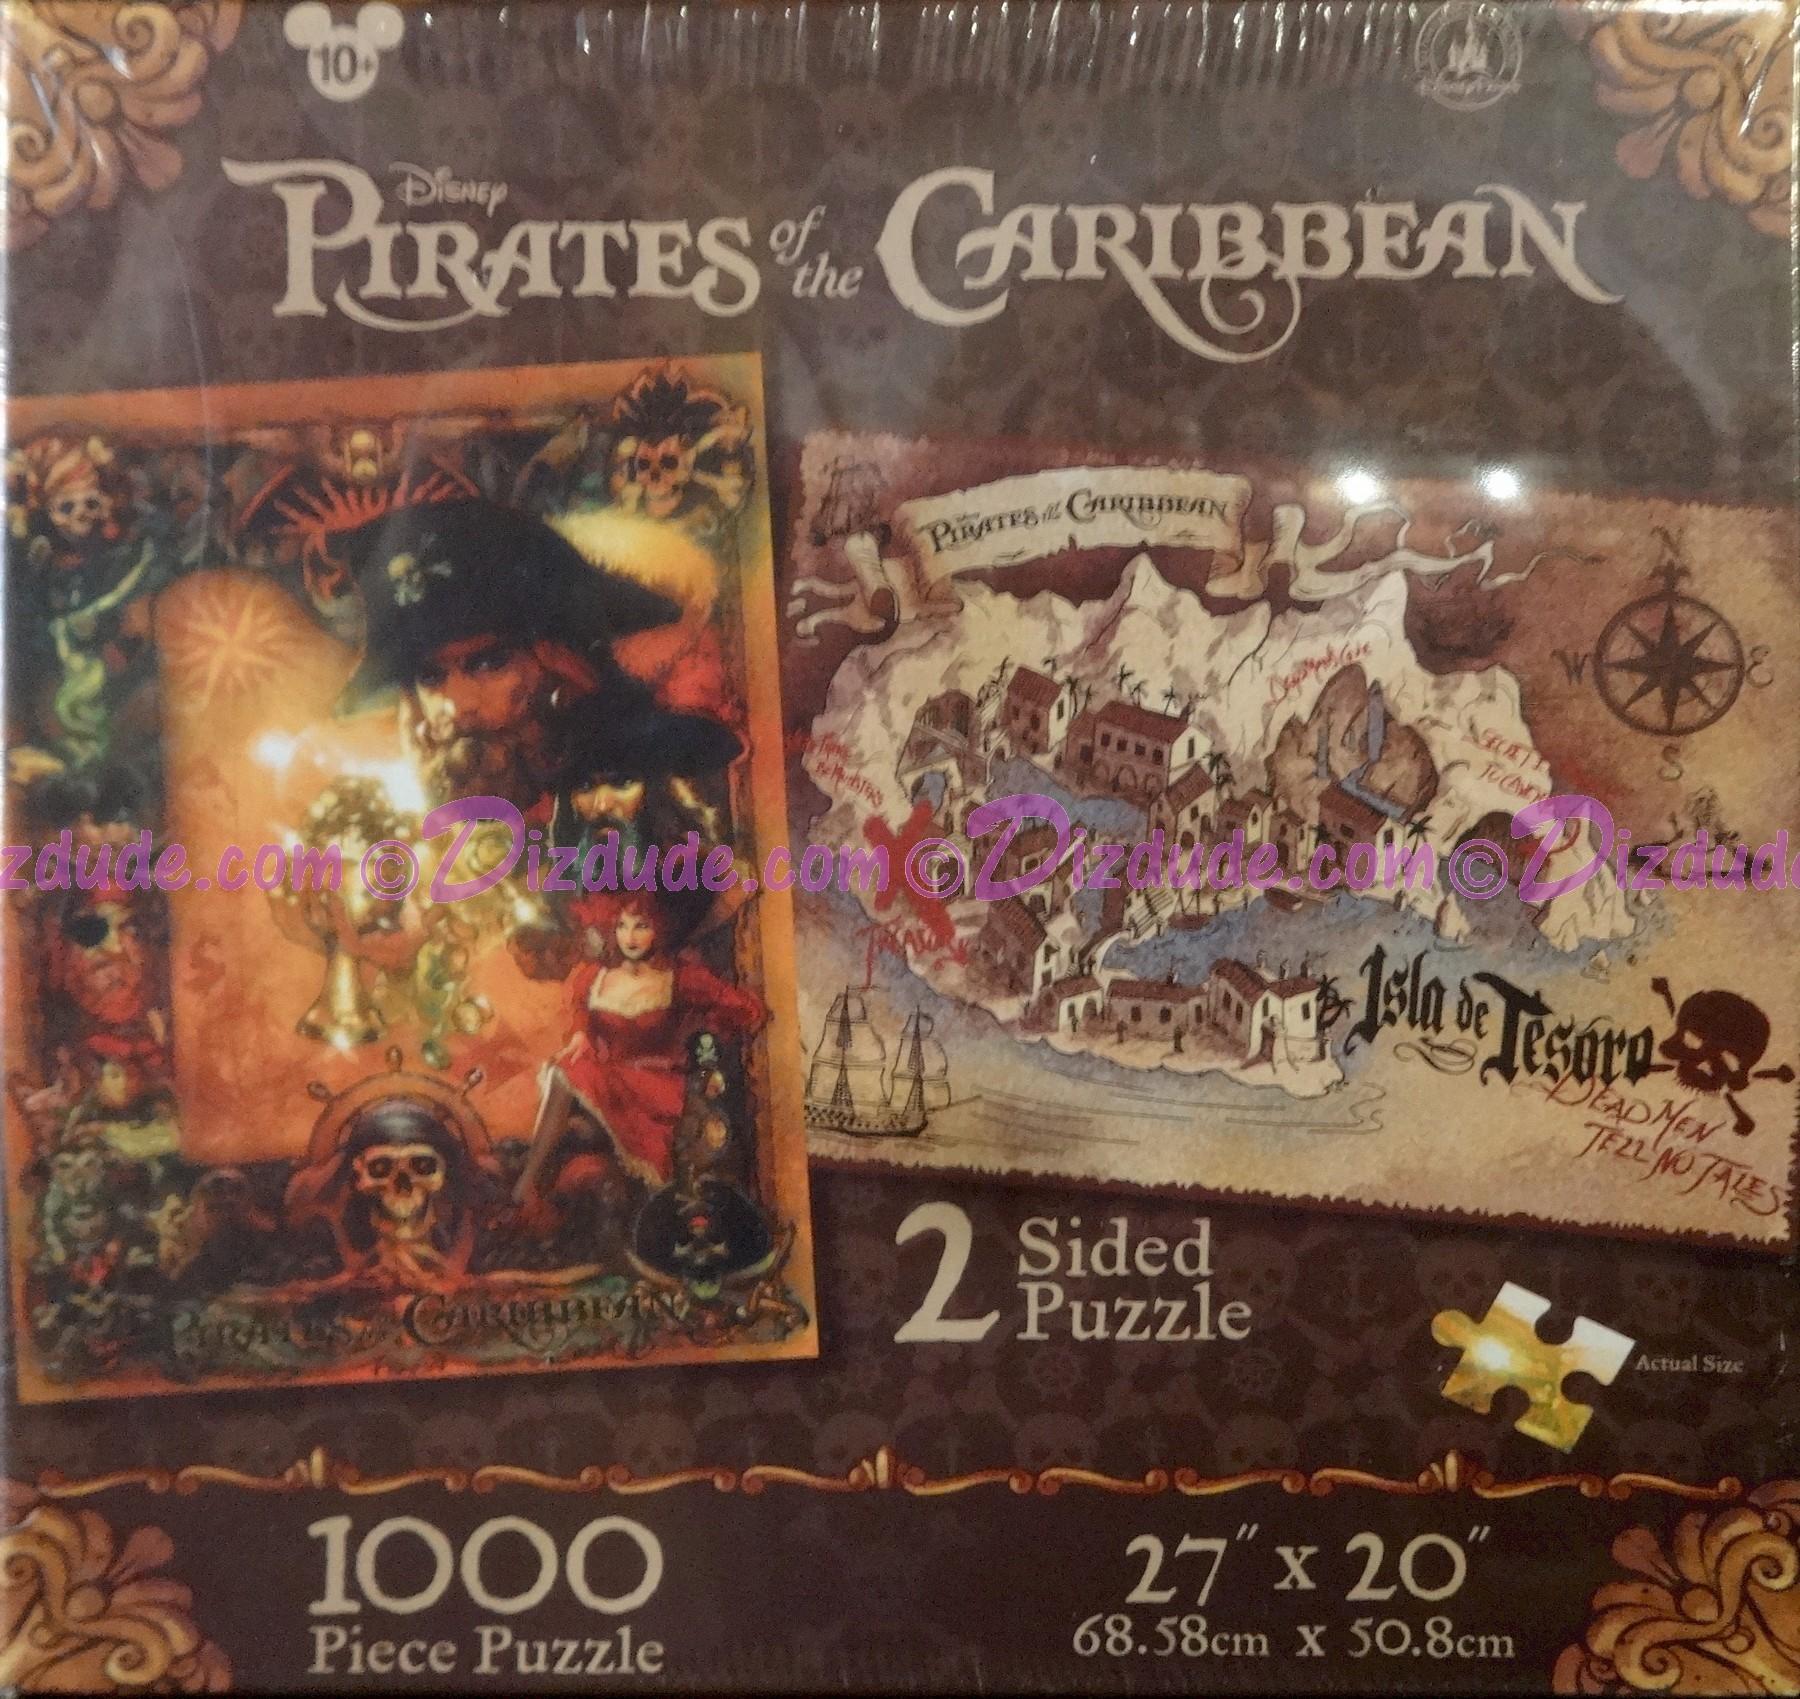 Disney Pirates of the Caribbean Double Sided 1000 Piece Puzzle © Dizdude.com